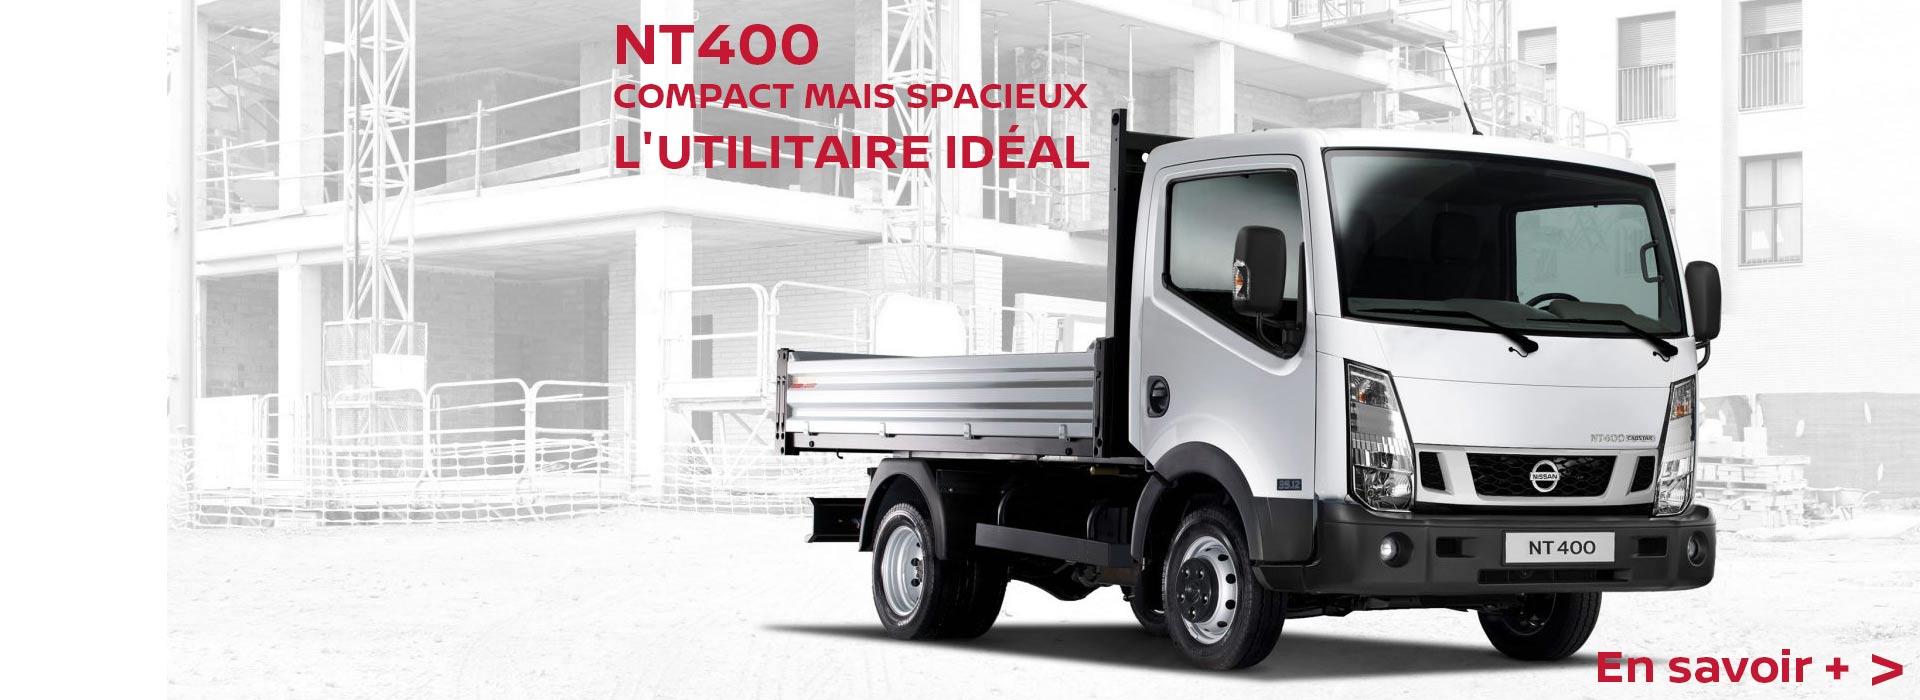 Nissan-NT400